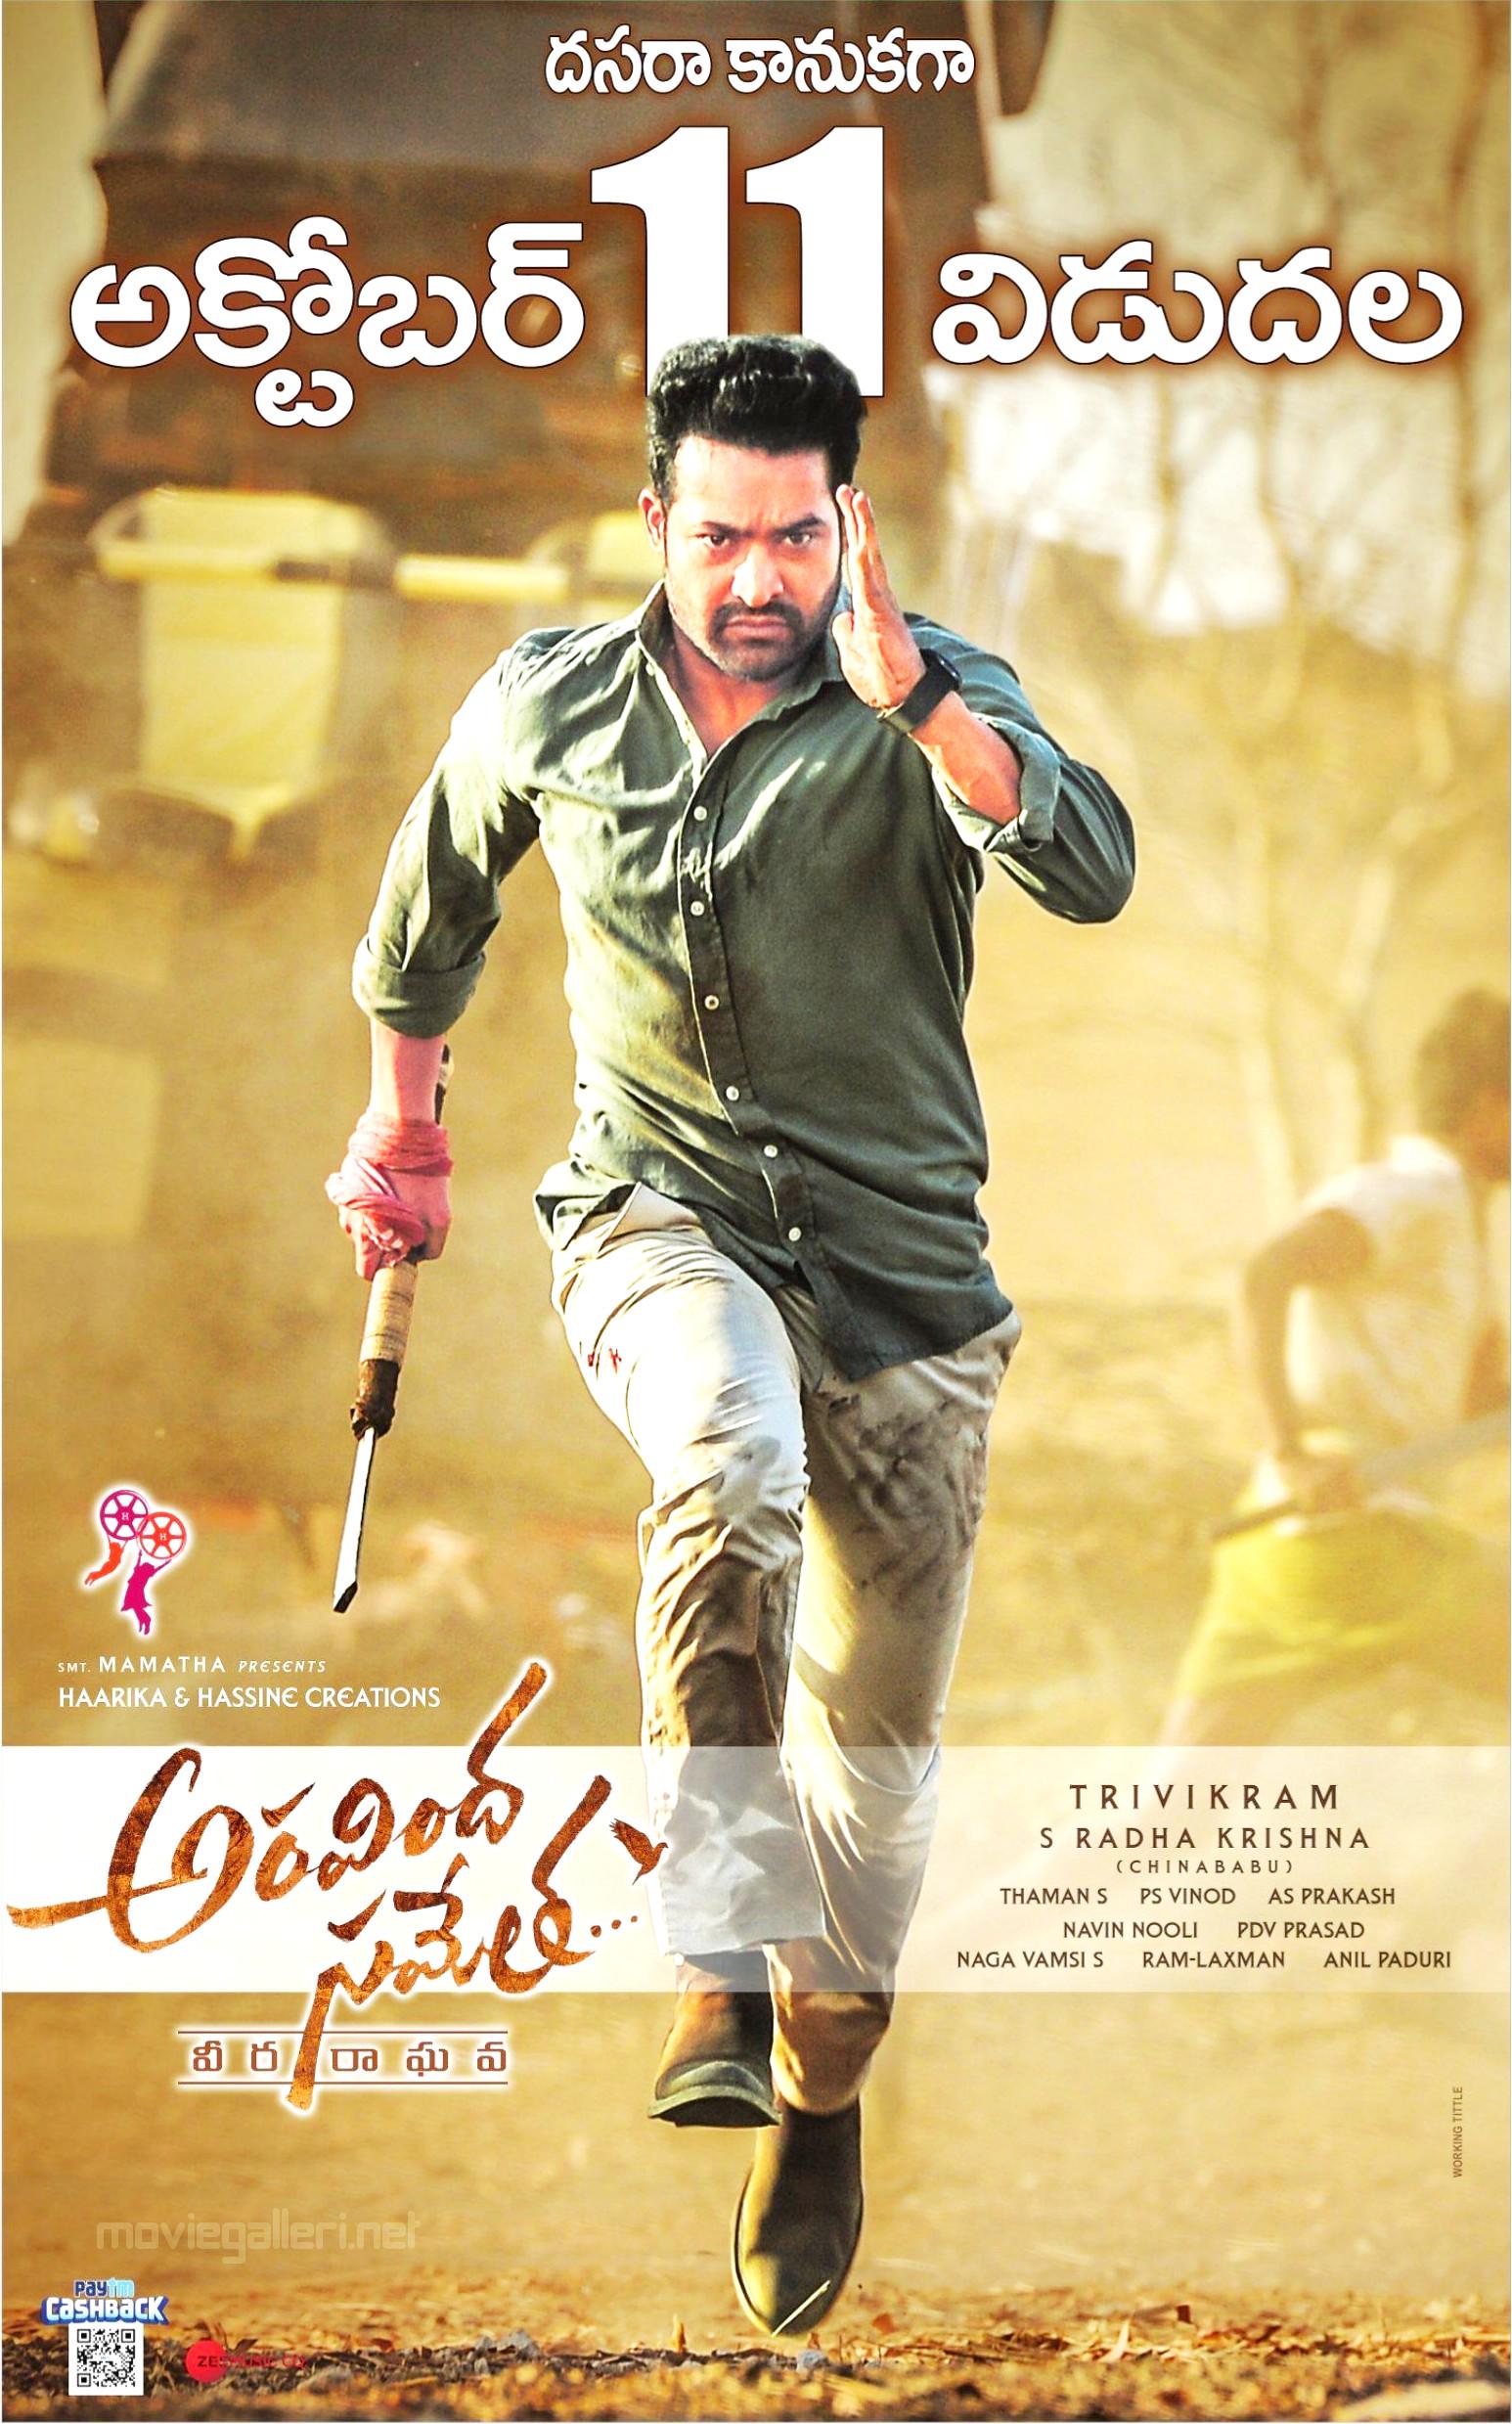 Jr NTR Aravindha Sametha On Oct 11th New Poster HD